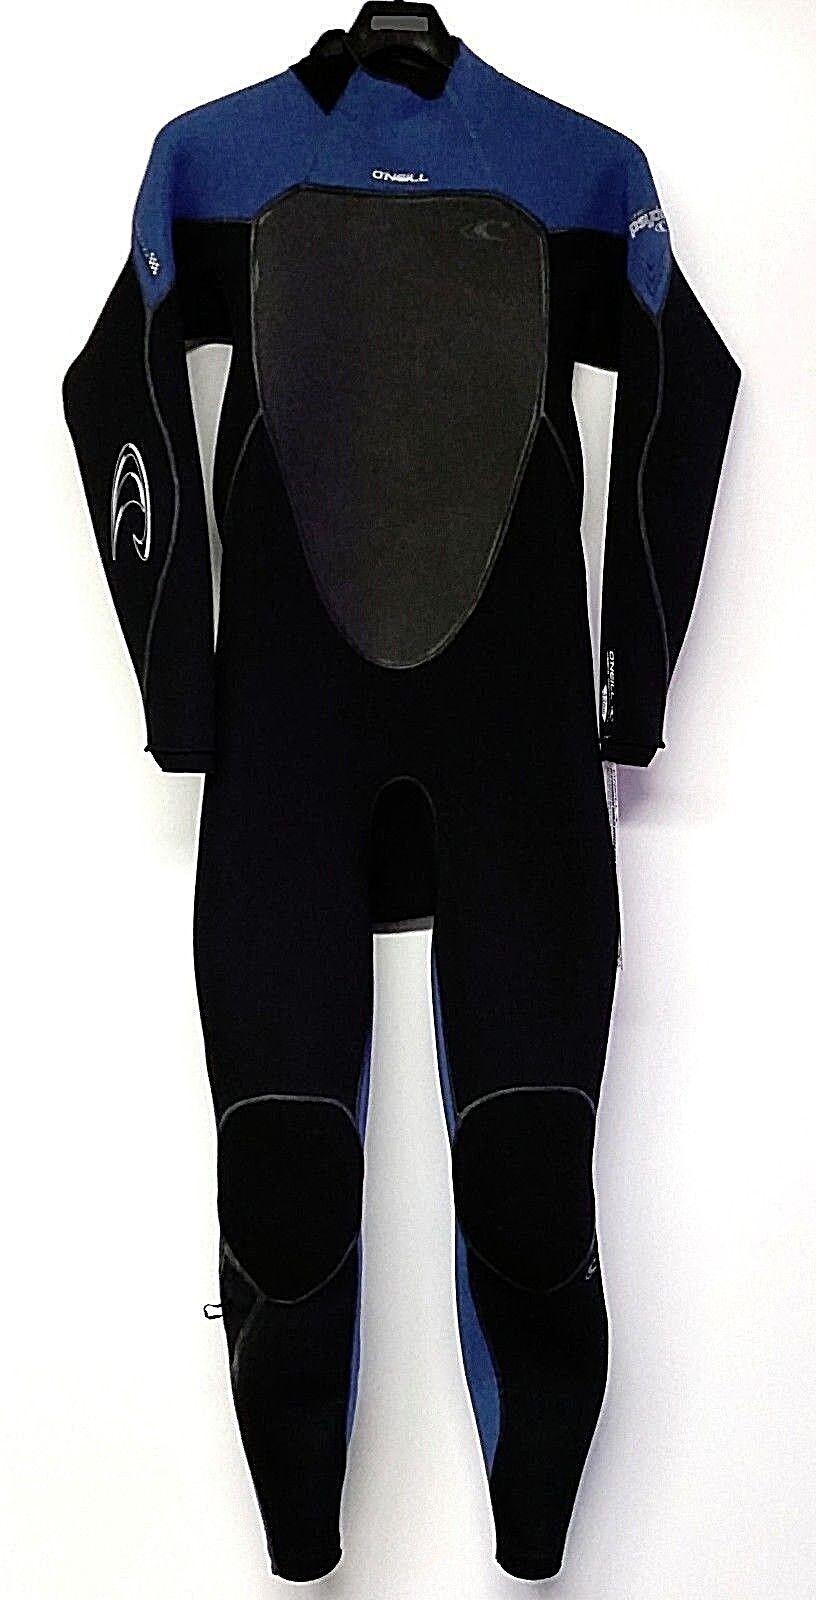 O'NEILL Men's 3 2 PSYCHO 3 Zen Zip Wetsuit  - Blk DeepSea Blk - Size Small - NWT  online